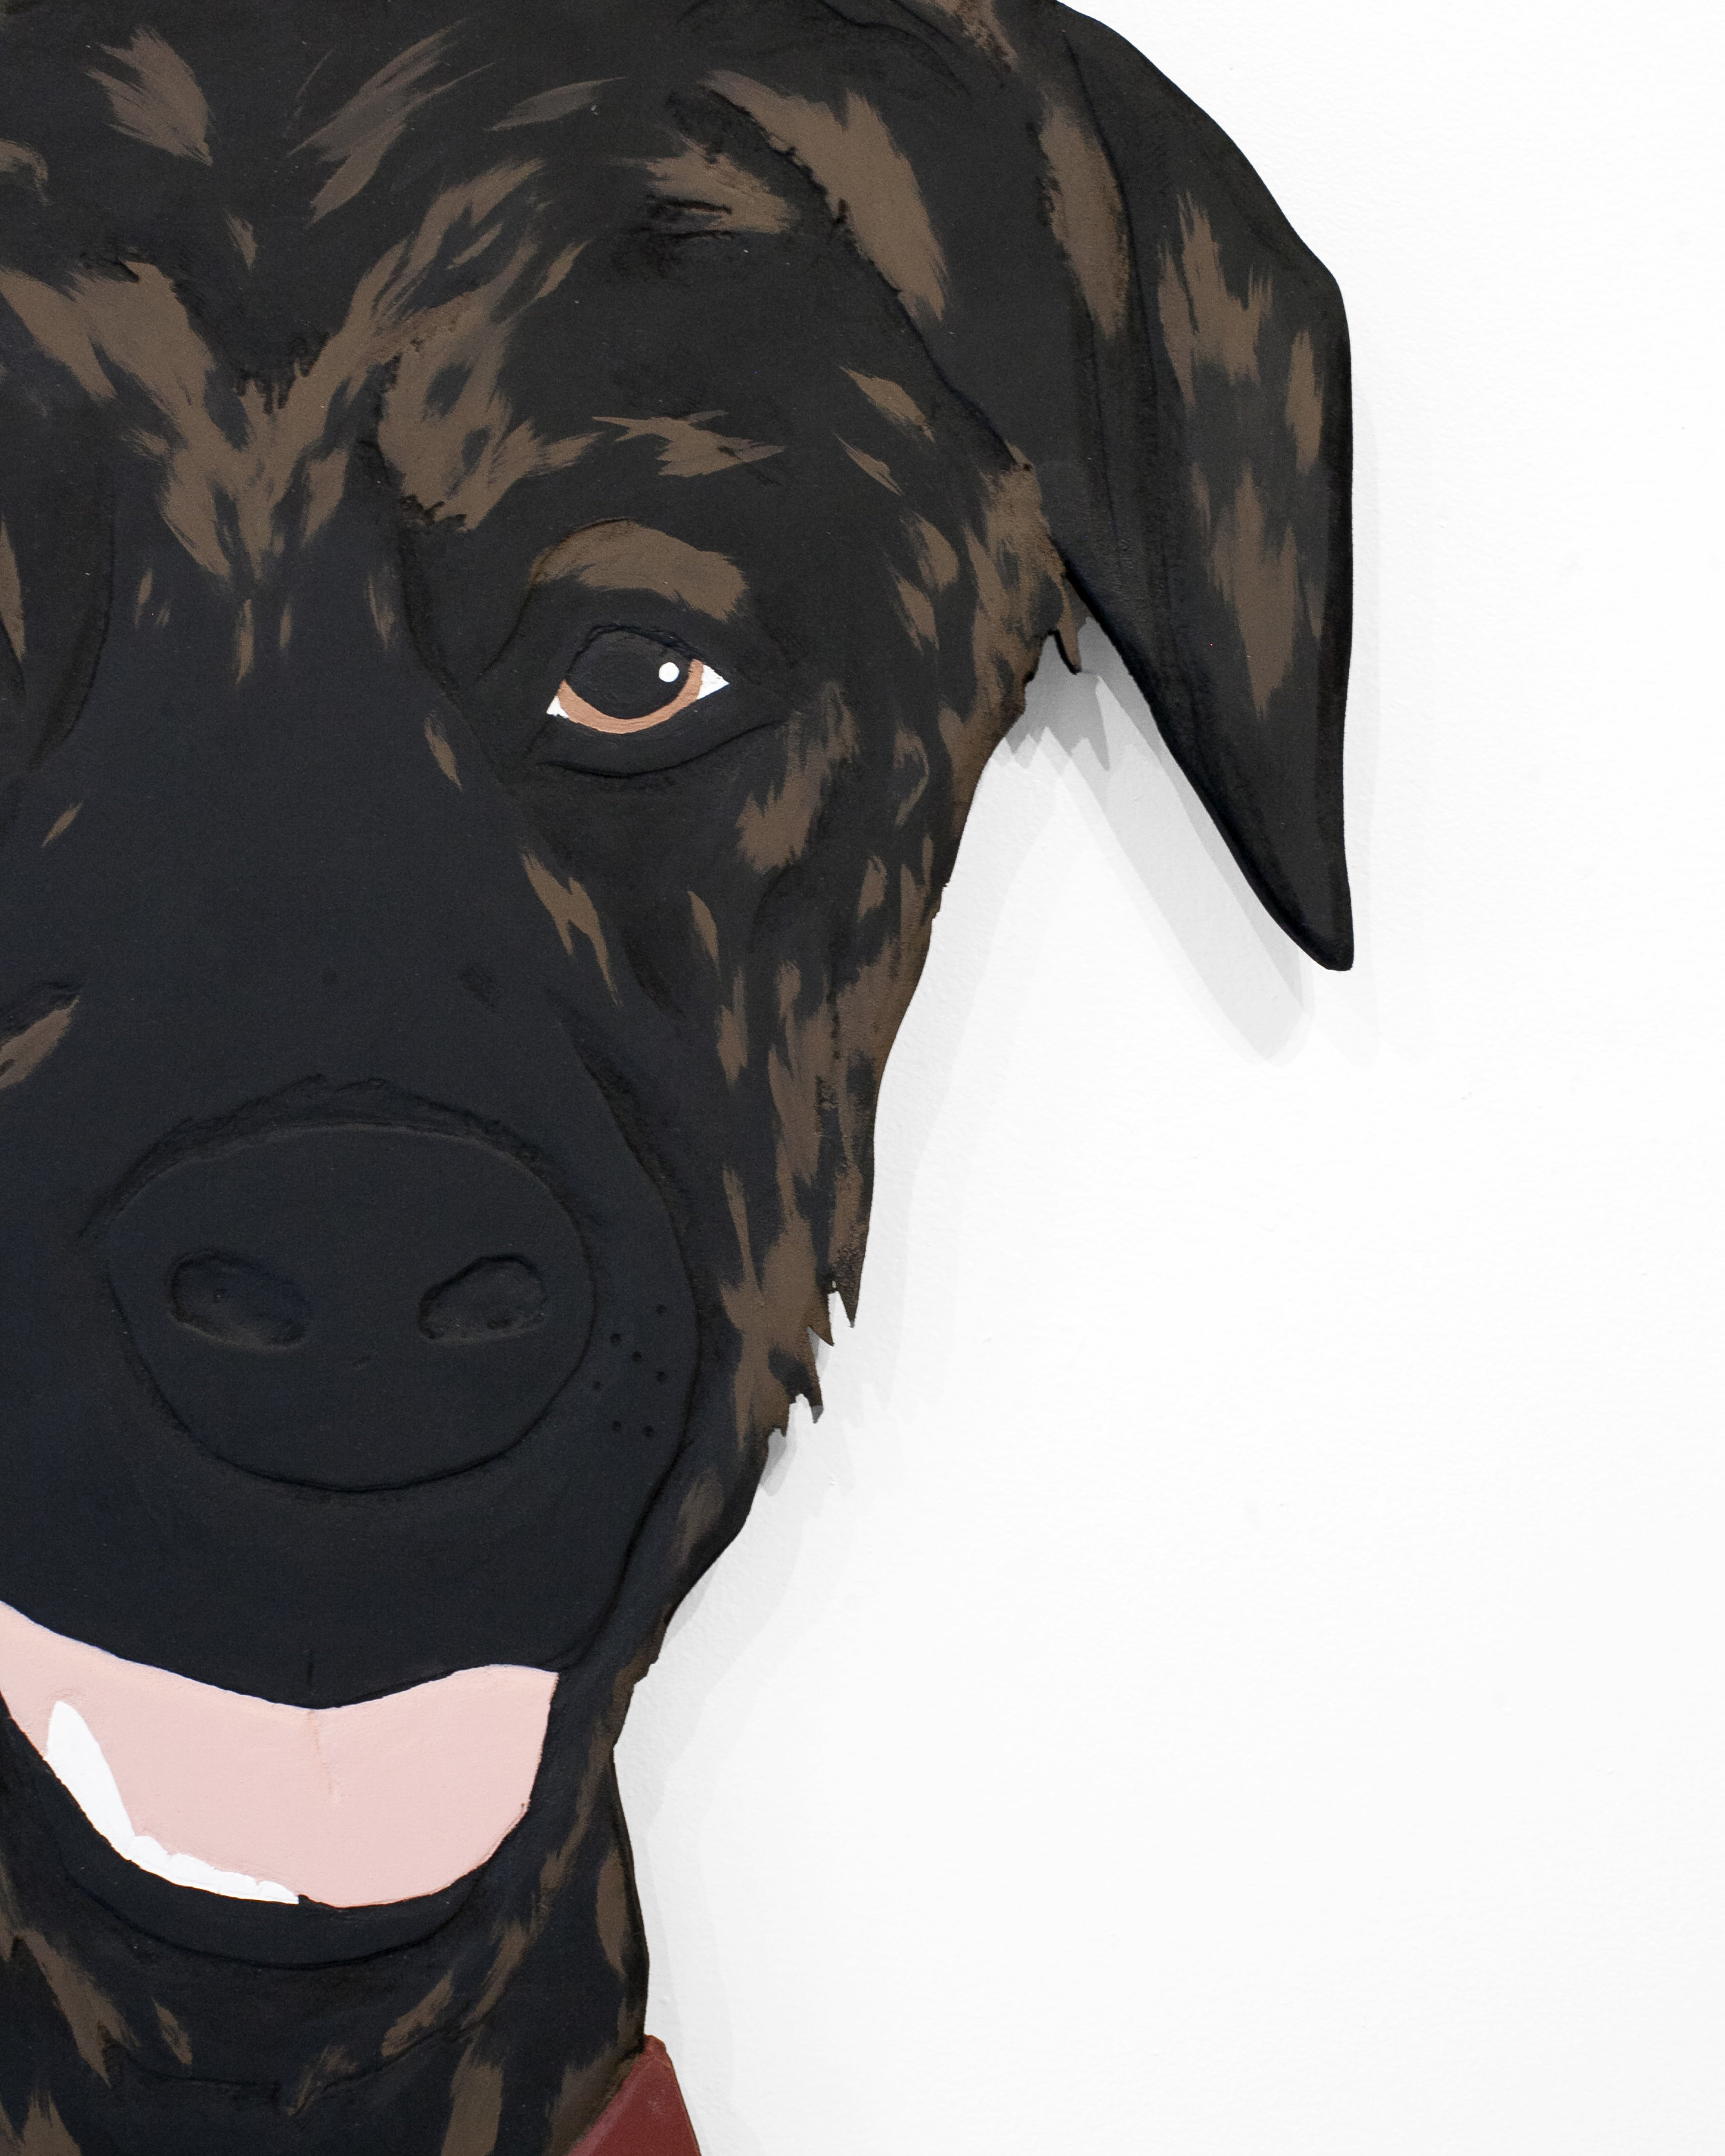 oliverhawk_doghead_1.jpg